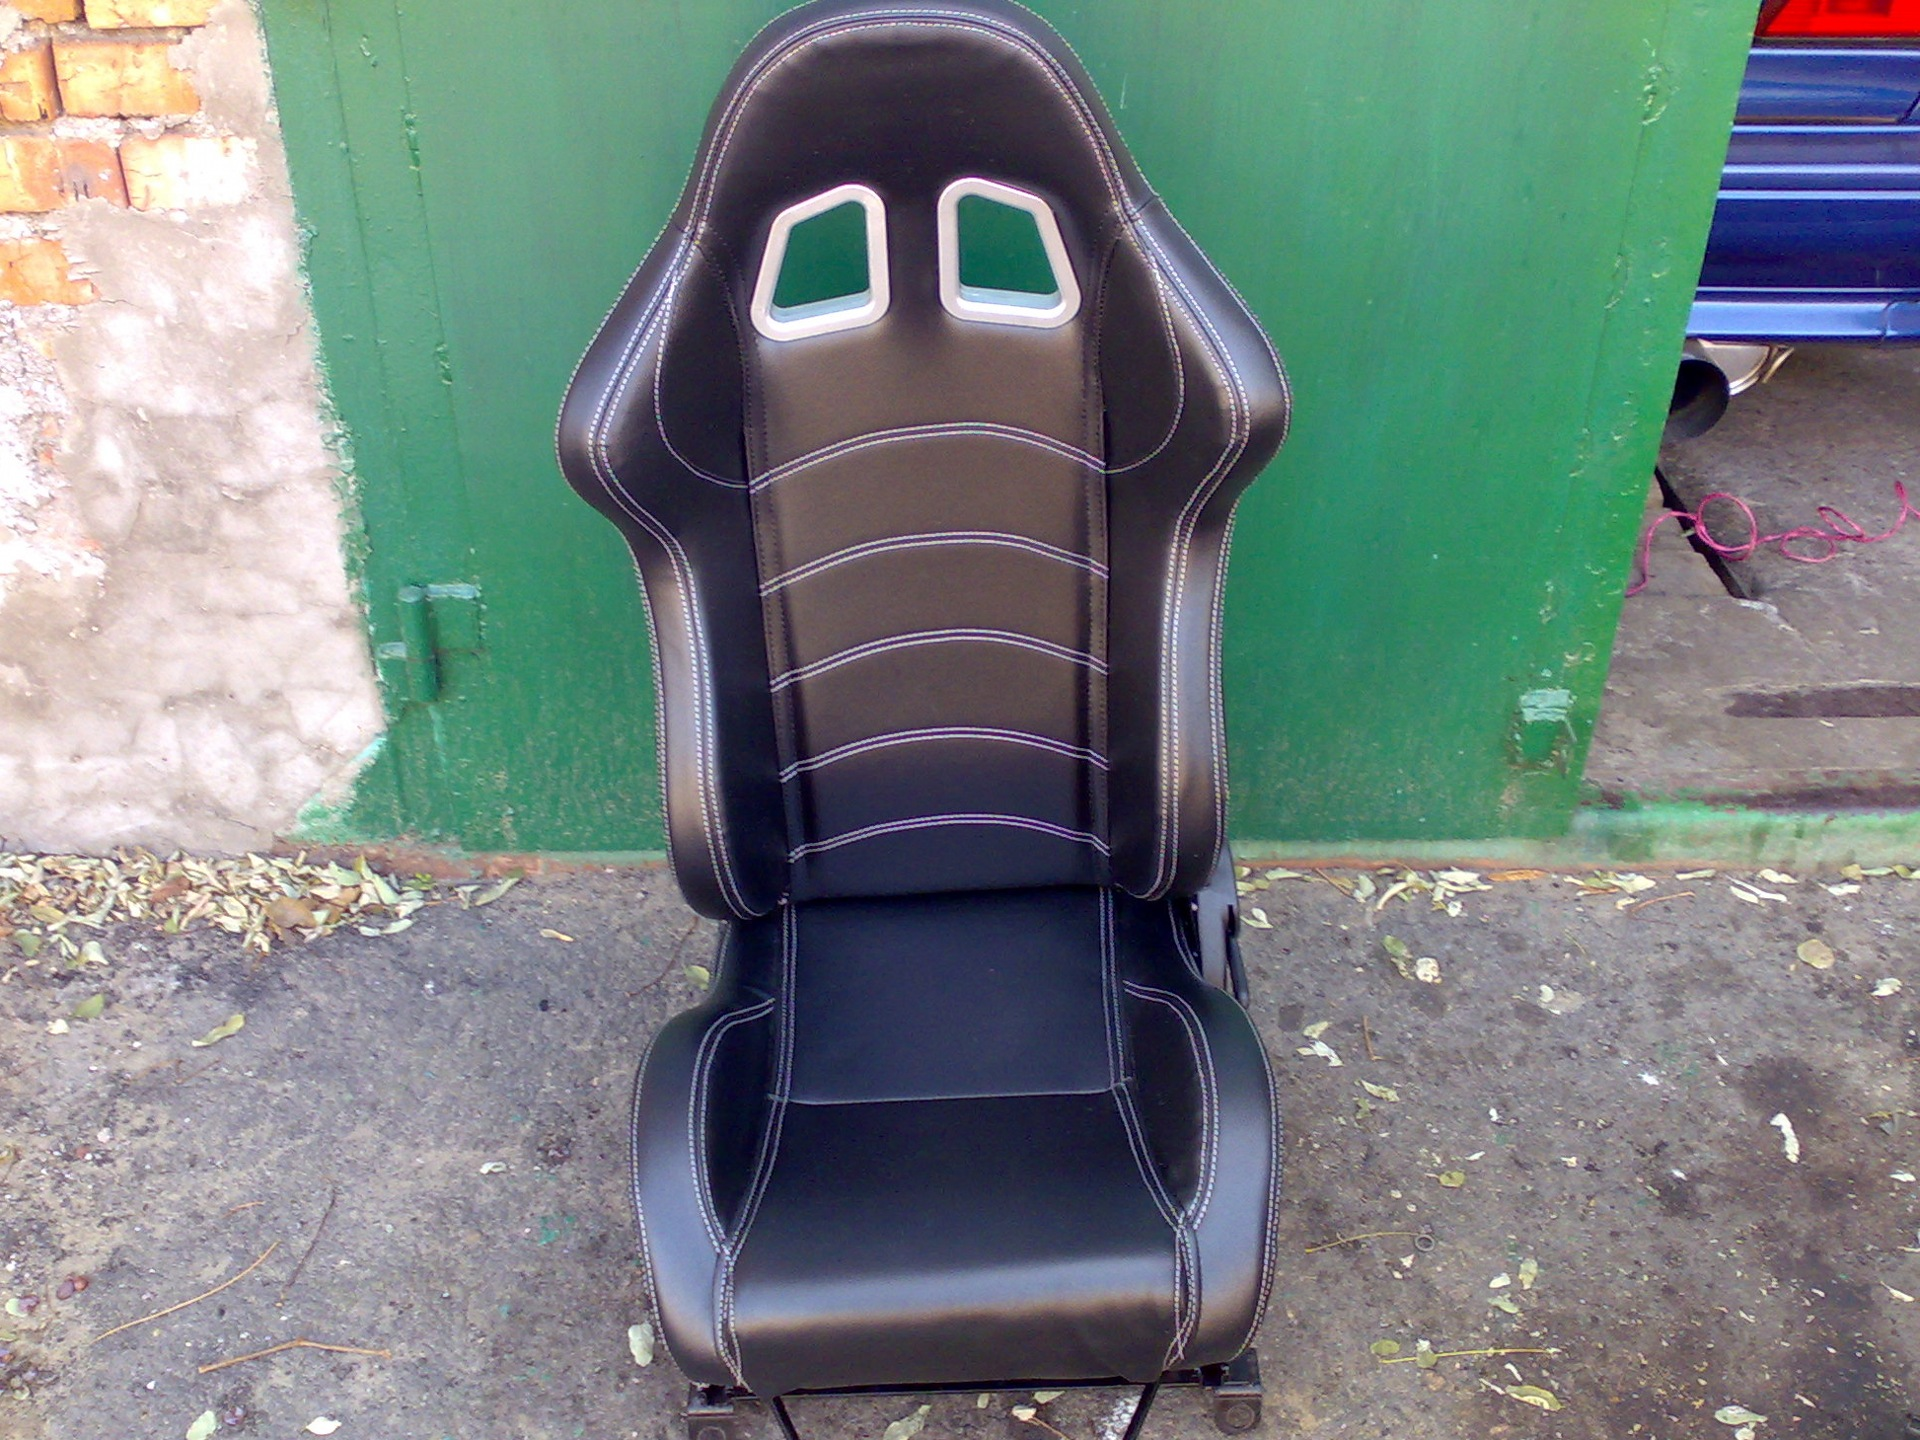 Кресло подвесное на дачу своими руками 15